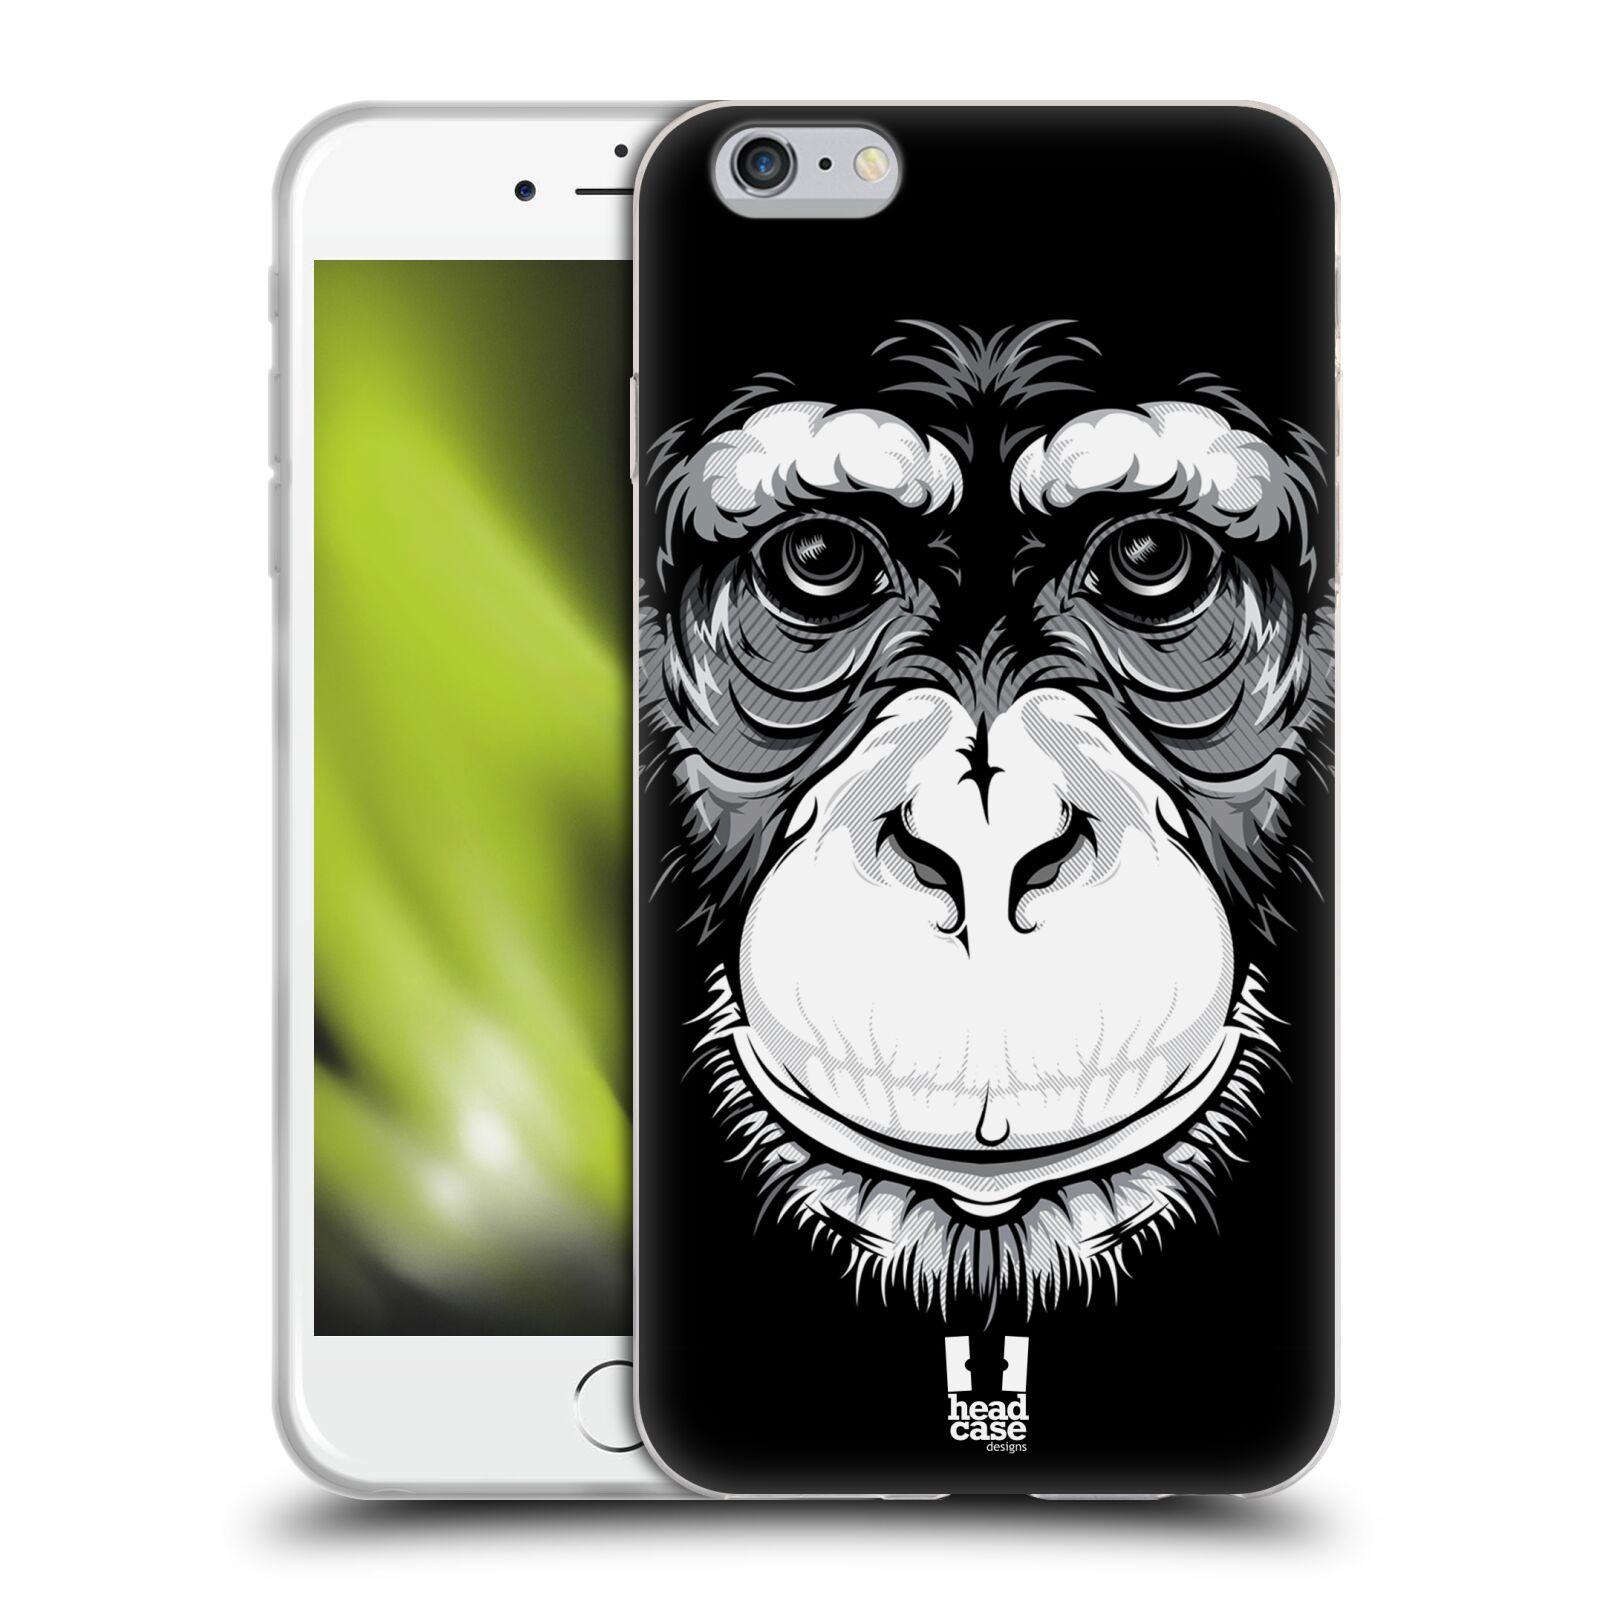 HEAD CASE silikonový obal na mobil Apple Iphone 6 PLUS/ 6S PLUS vzor Zvíře kreslená tvář šimpanz